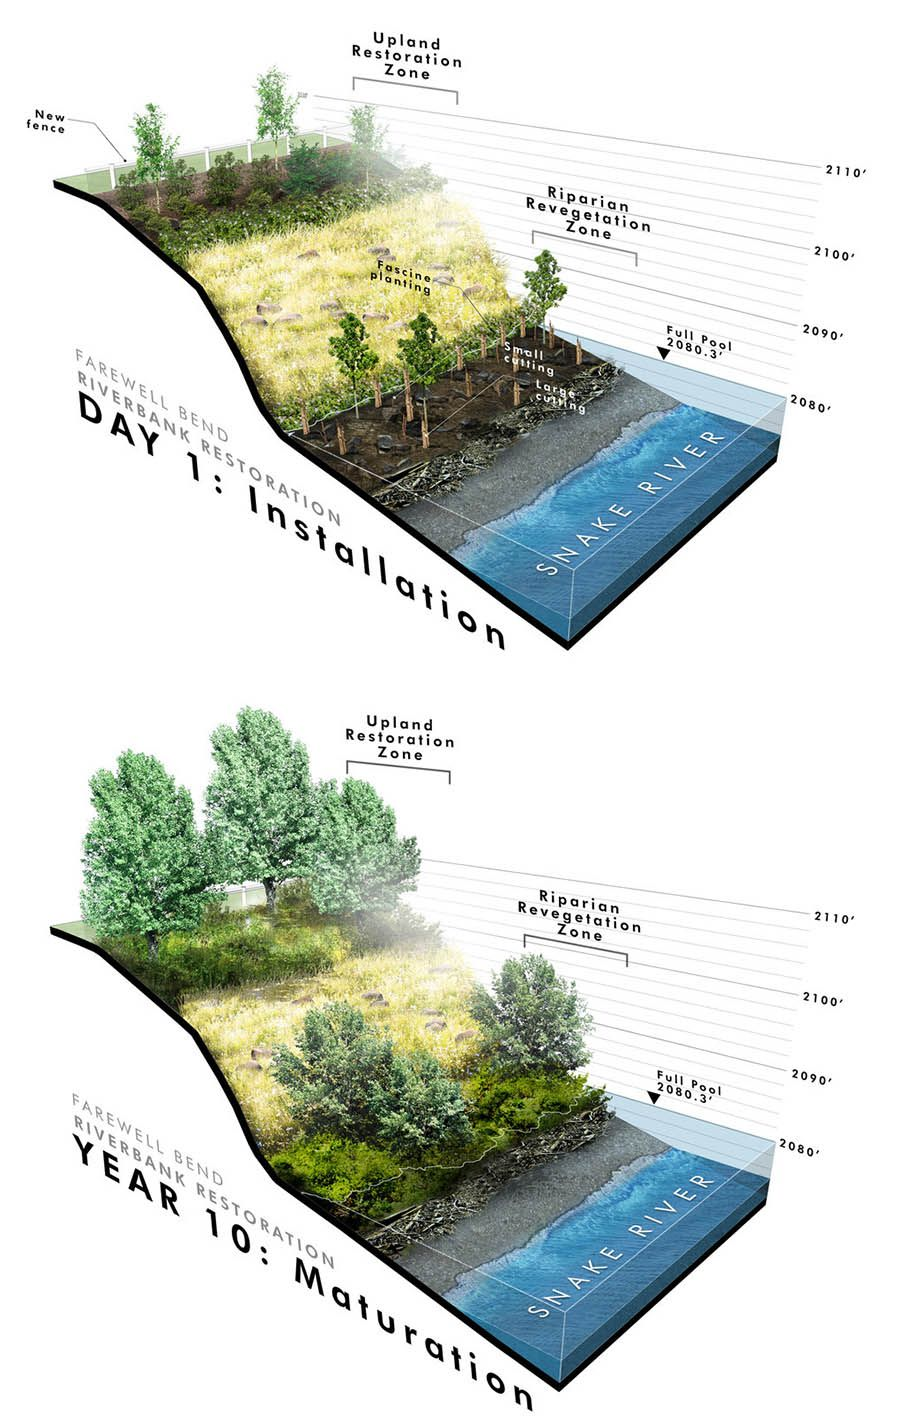 Farewell Bend State Park River Bank Restoration In 2020 Landscape Architecture Graphics Landscape Architecture Landscape Design